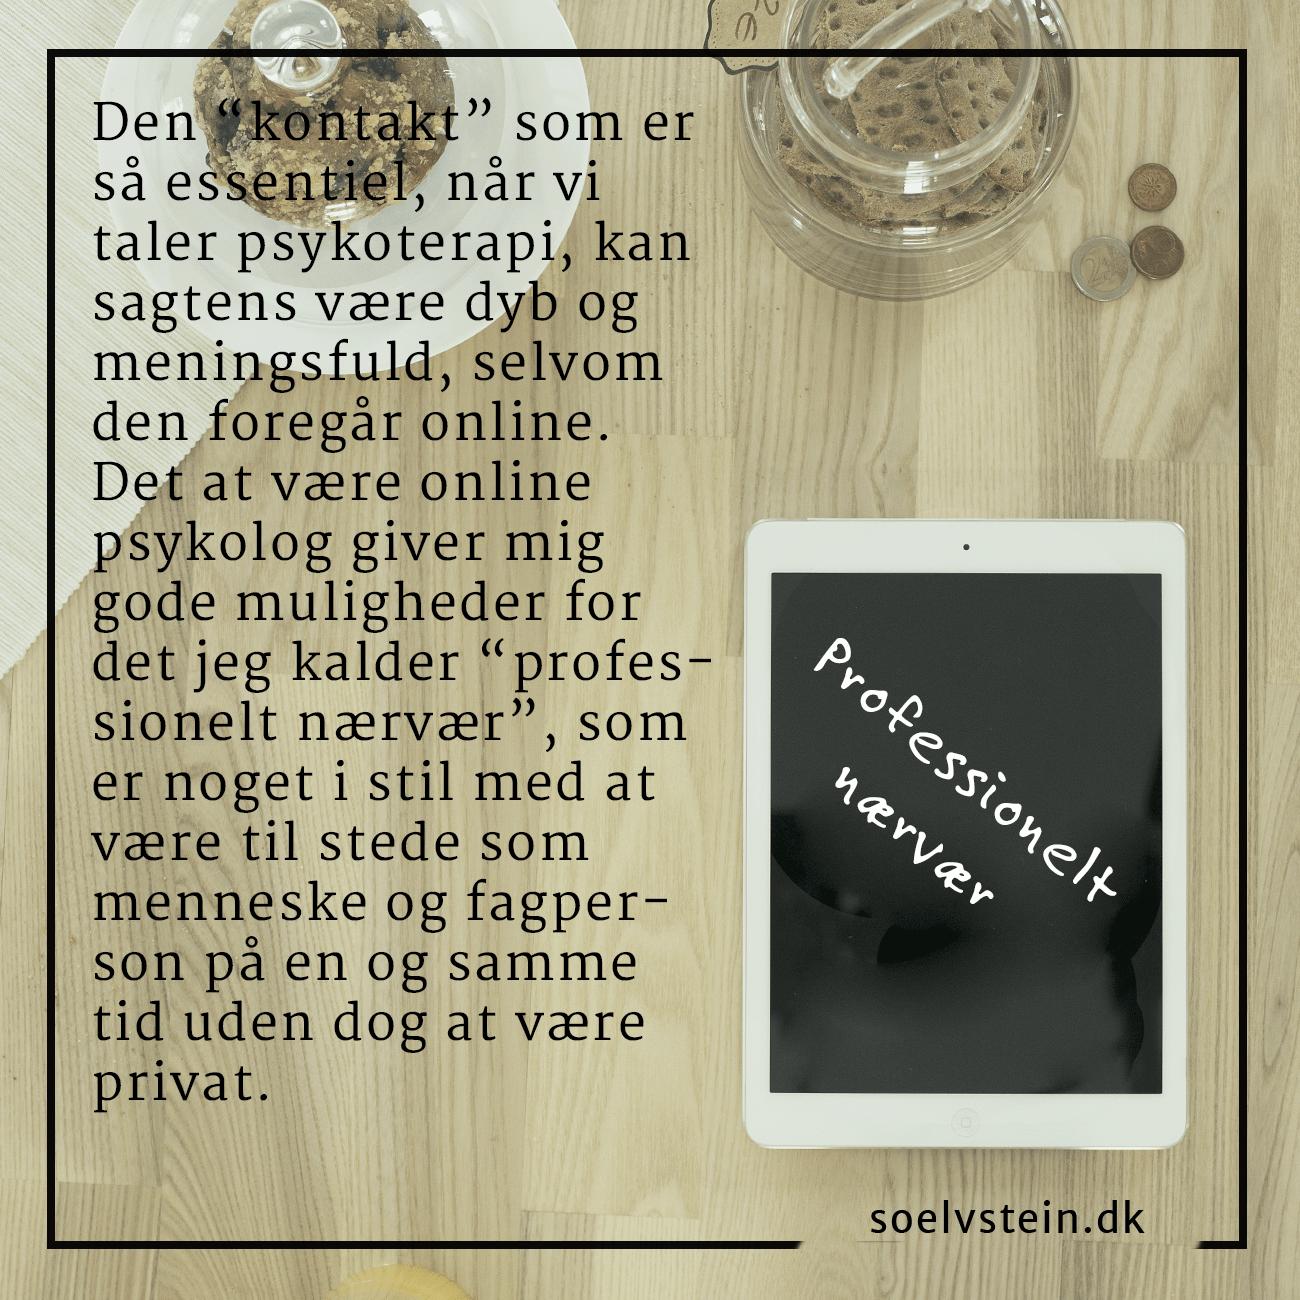 online psykolog